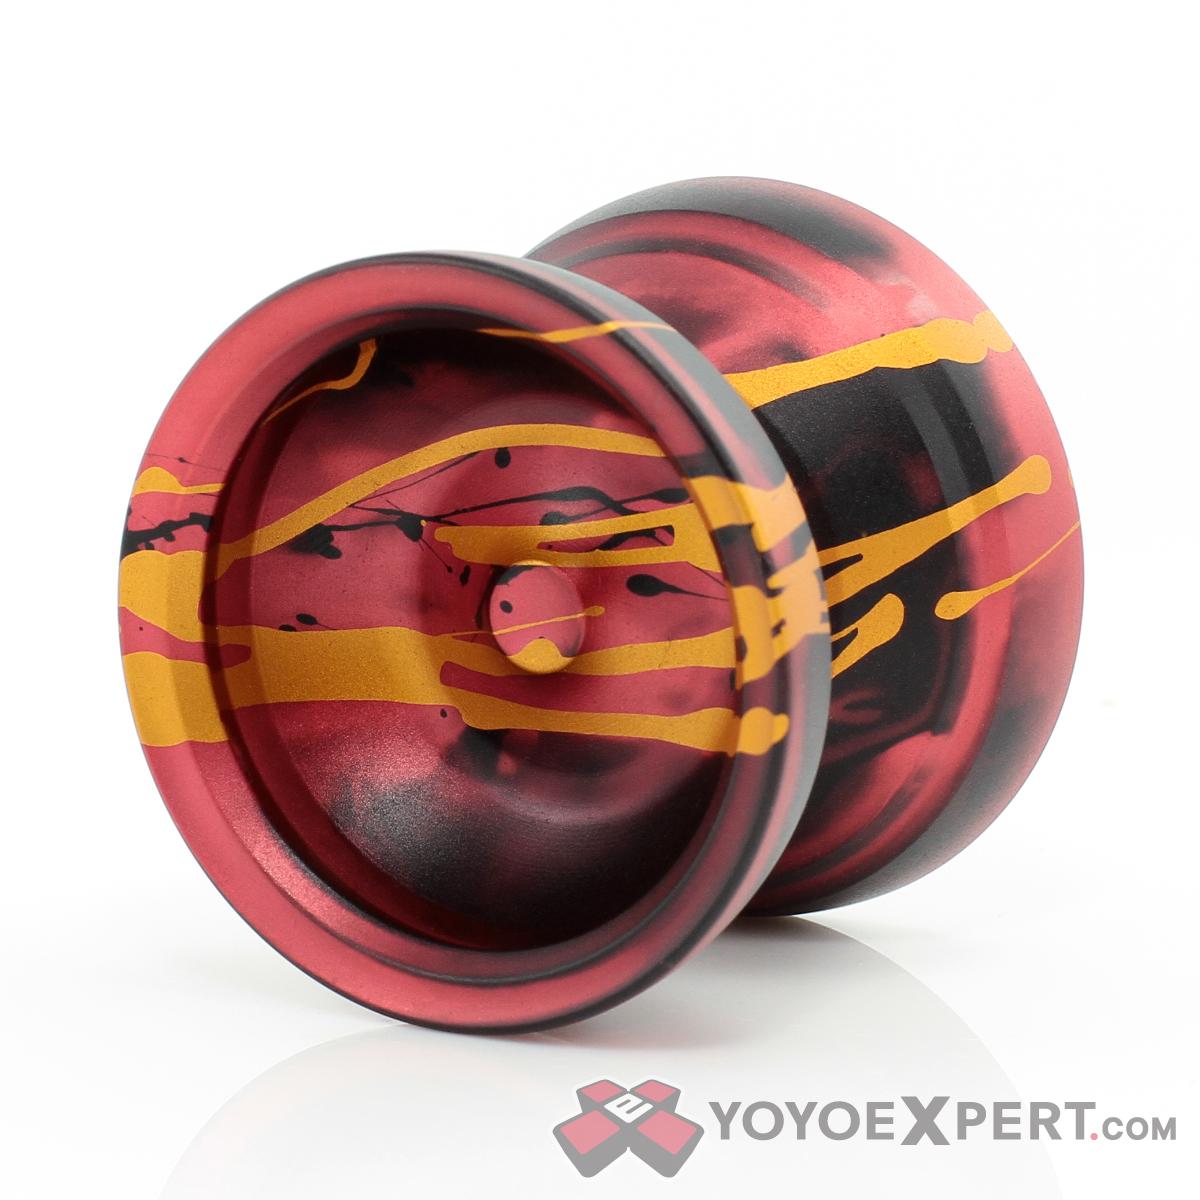 how effective is protonix